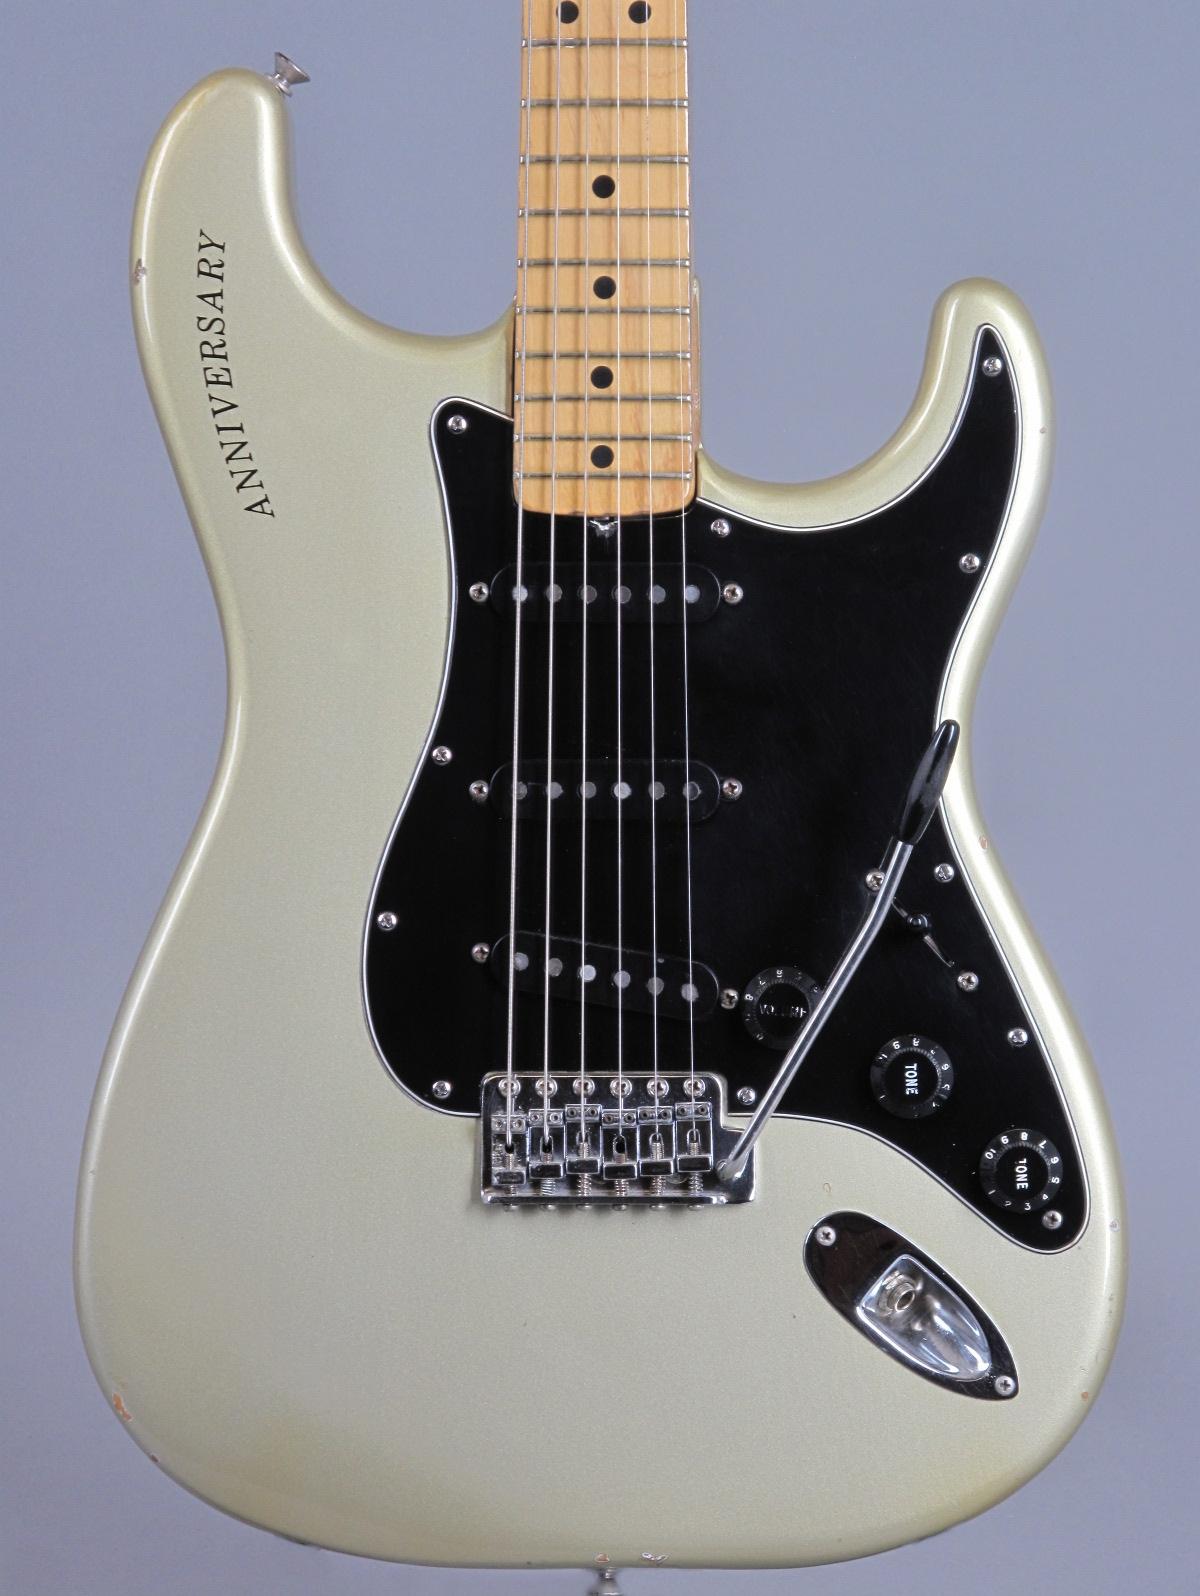 1979 Fender Stratocaster 1954-1979 - 25th Anniversary